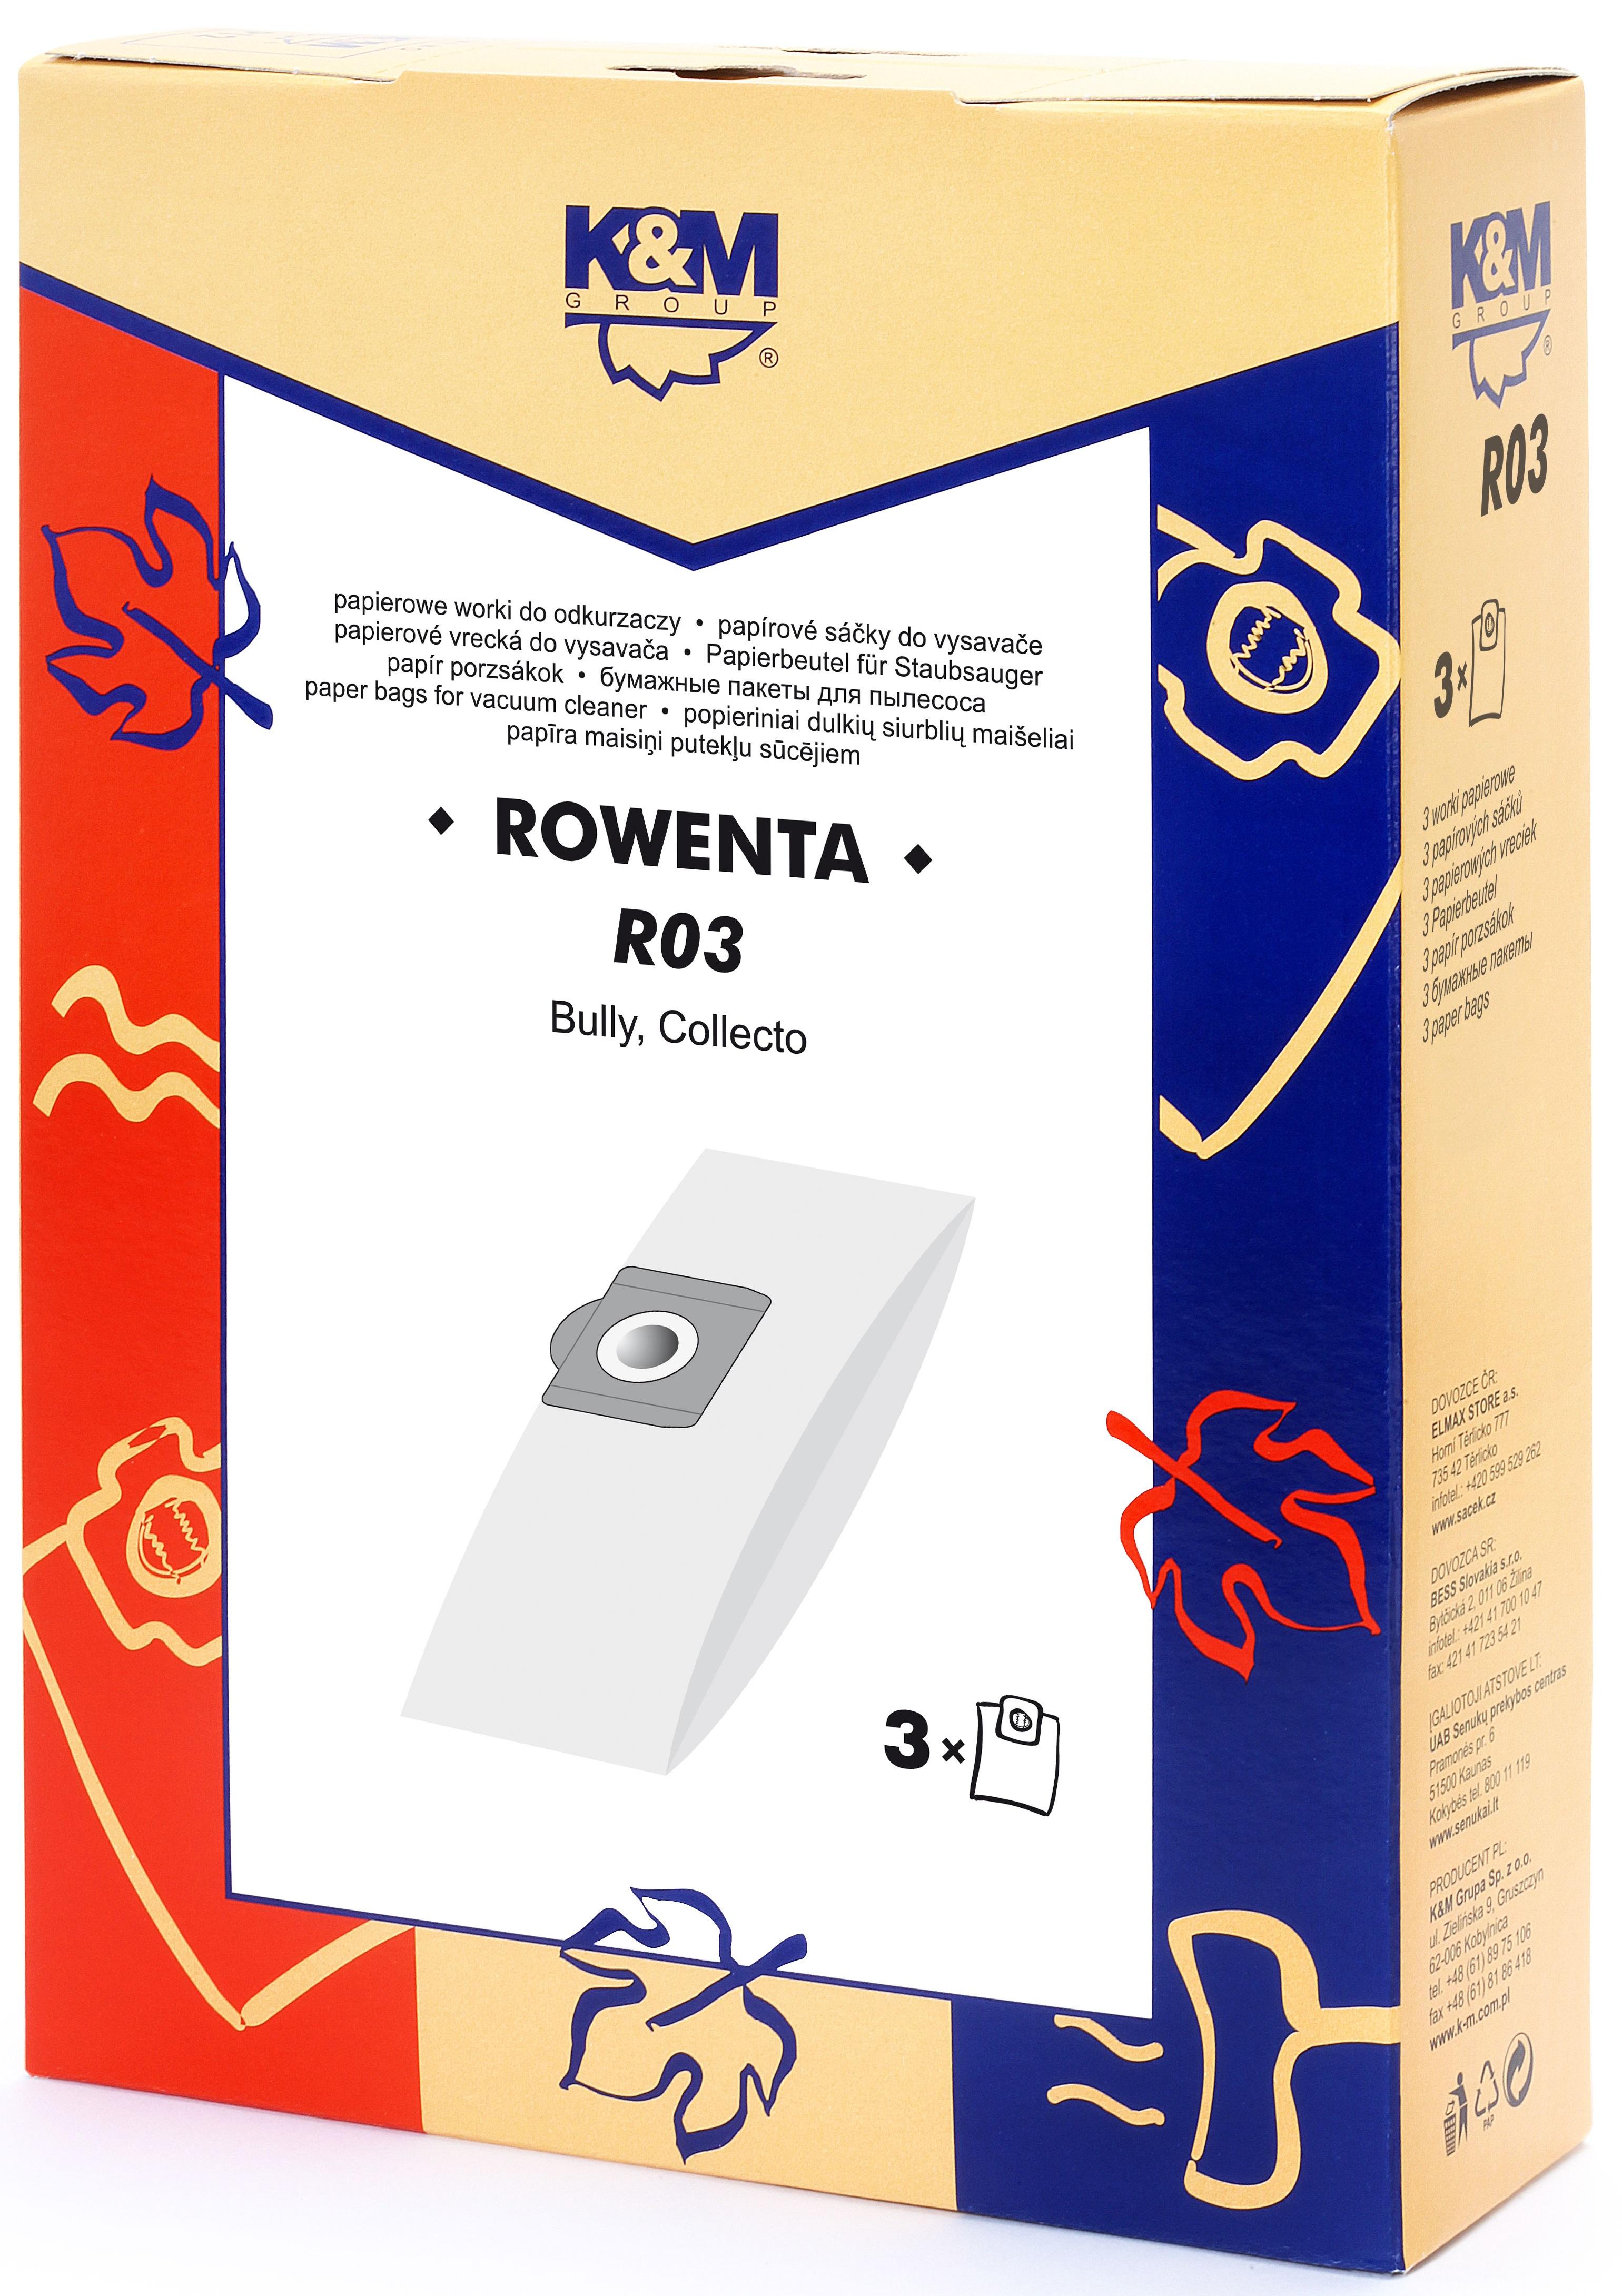 Sac aspirator Rowenta ZR814, hartie, 3X saci, K&M 0